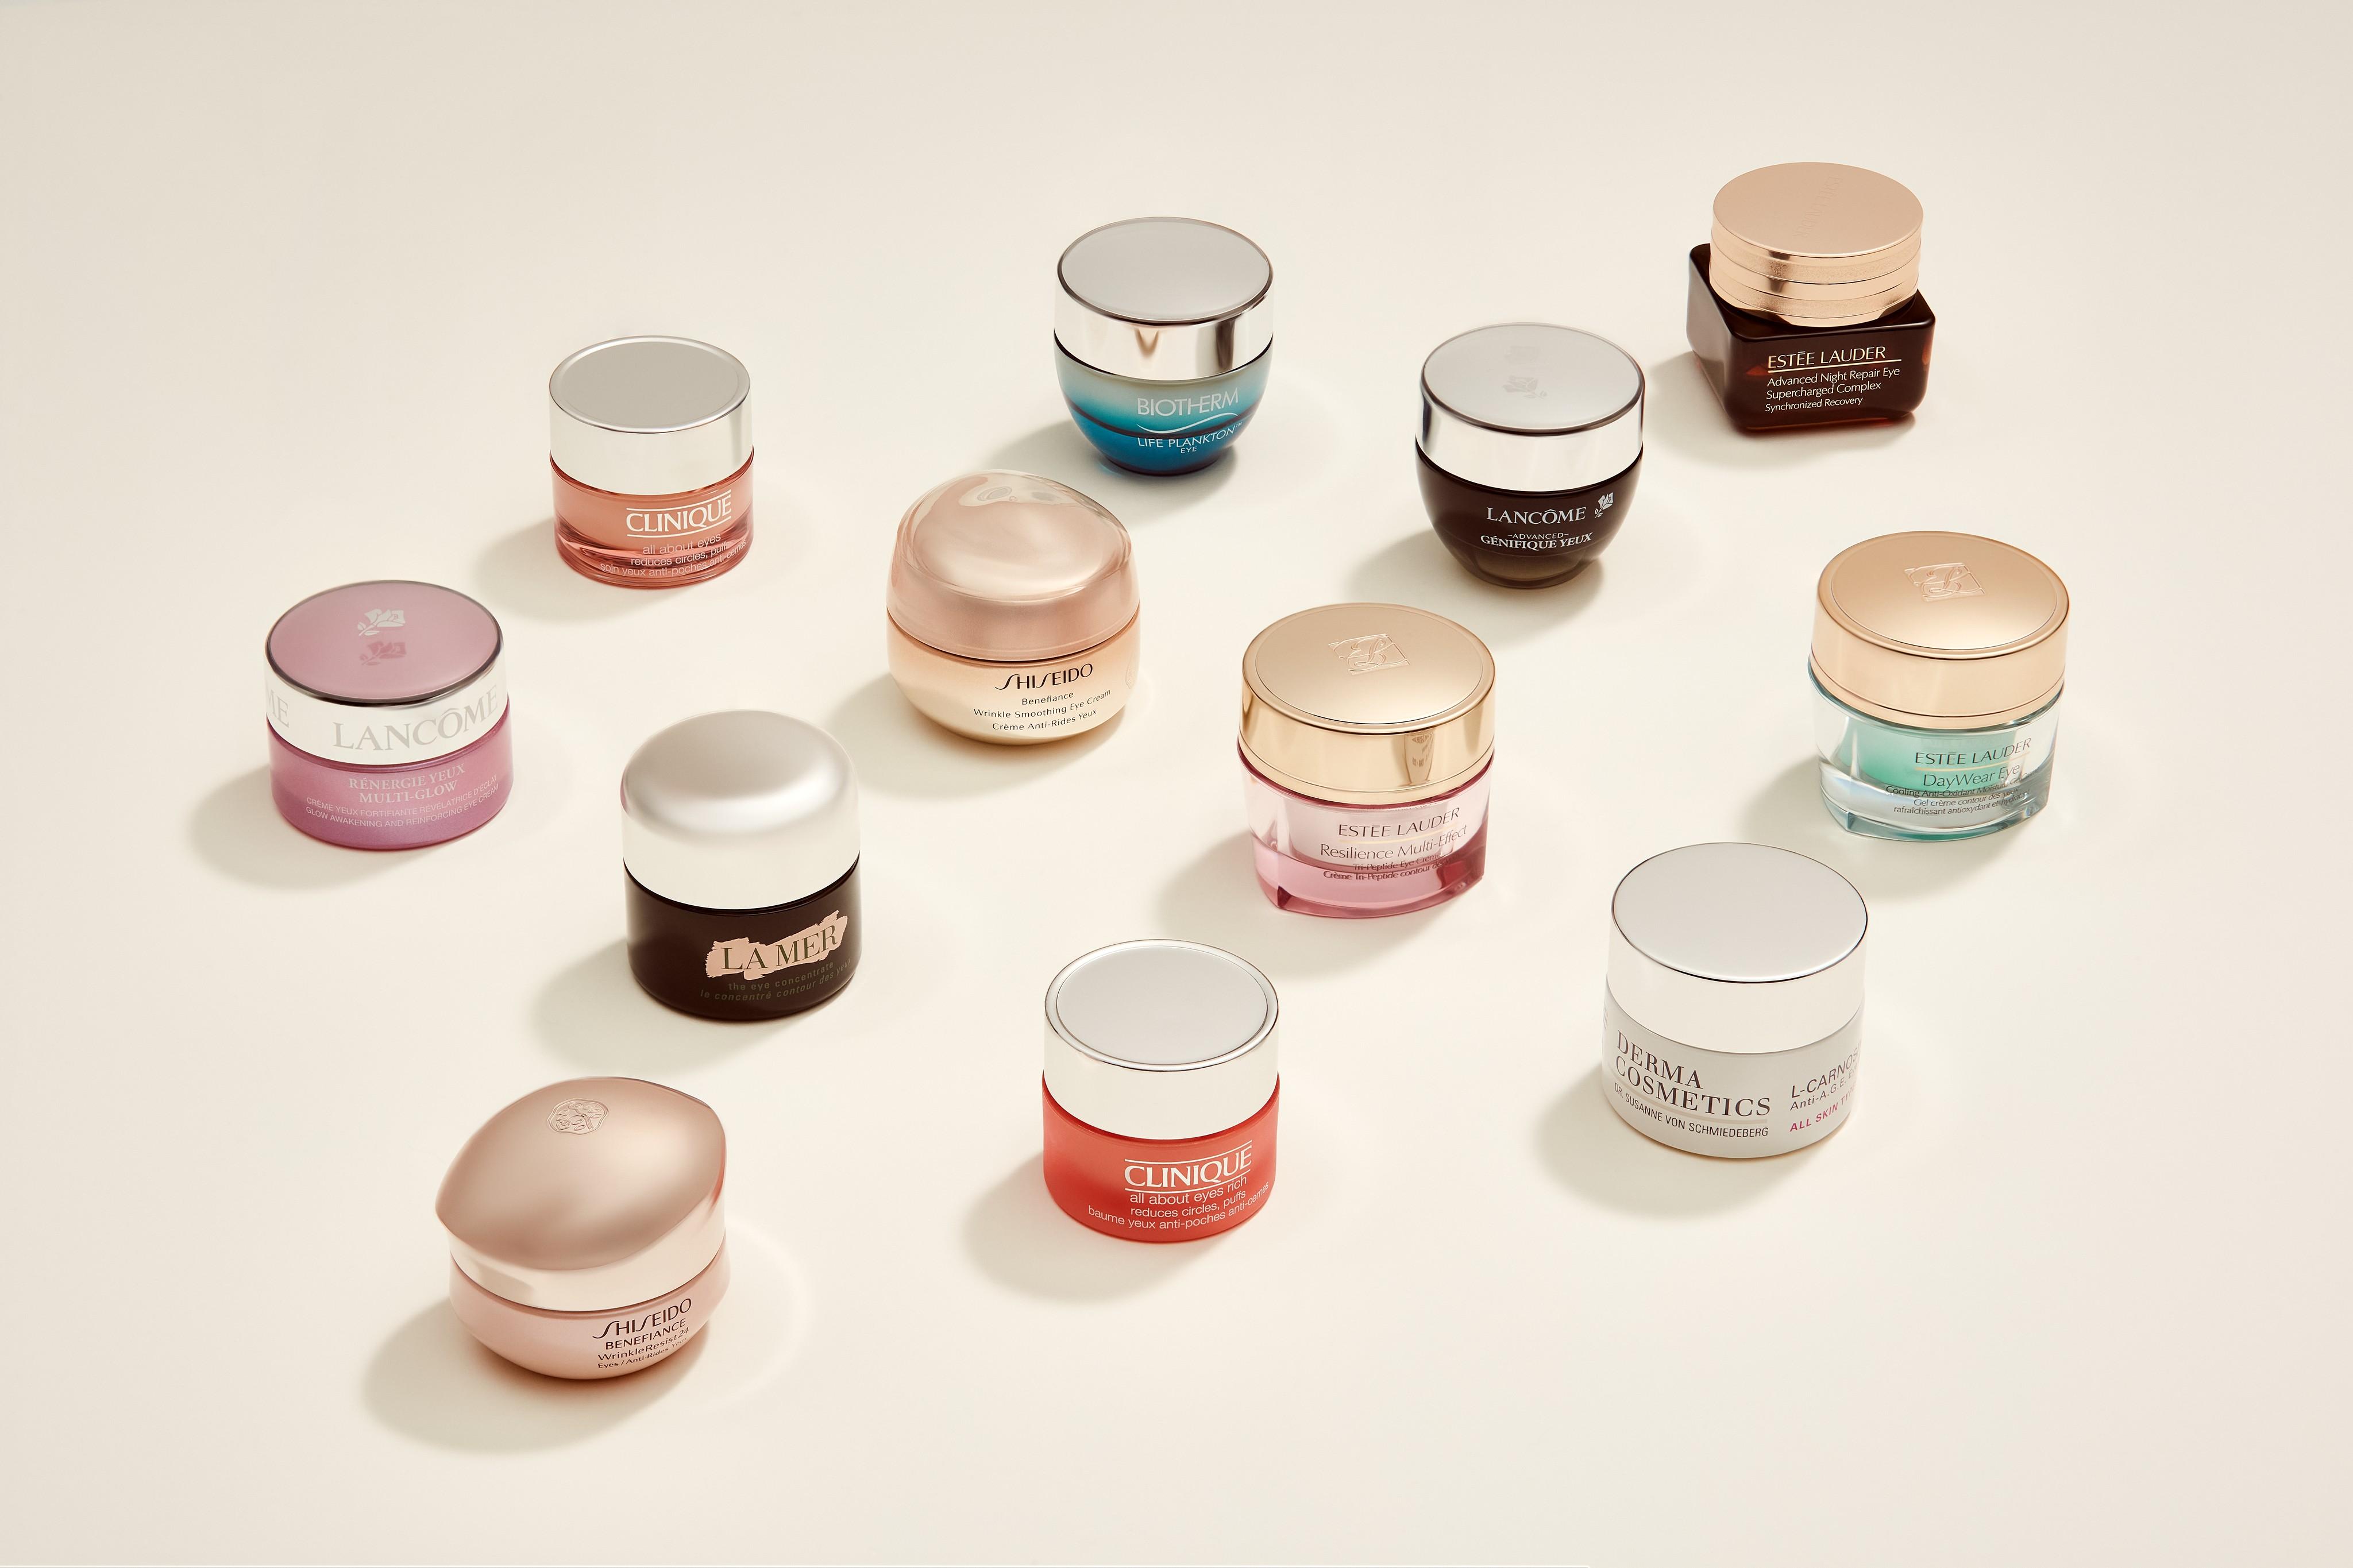 Skincare-product-bathroom-light-beige-shiseido-lamer-lancome-dermacosmetics-clinique-biotherm-unlimited-Web-Rendition